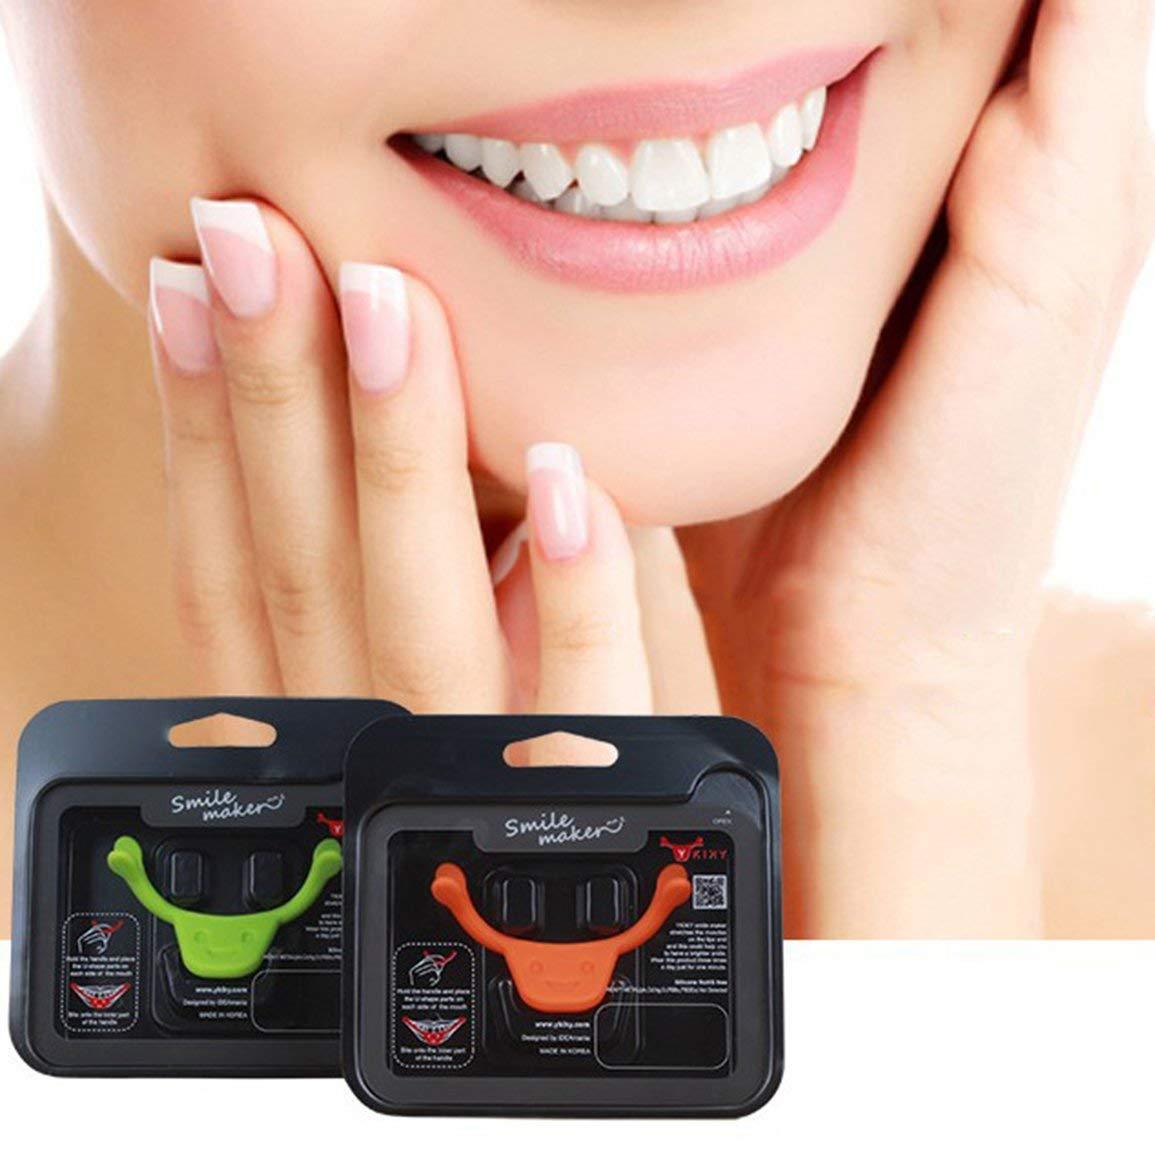 Portable Size Men Women Authentic Charming Smile Braces Mouth Lip Aid Smile Face Training Corrector Face Life Tools Color:Orange